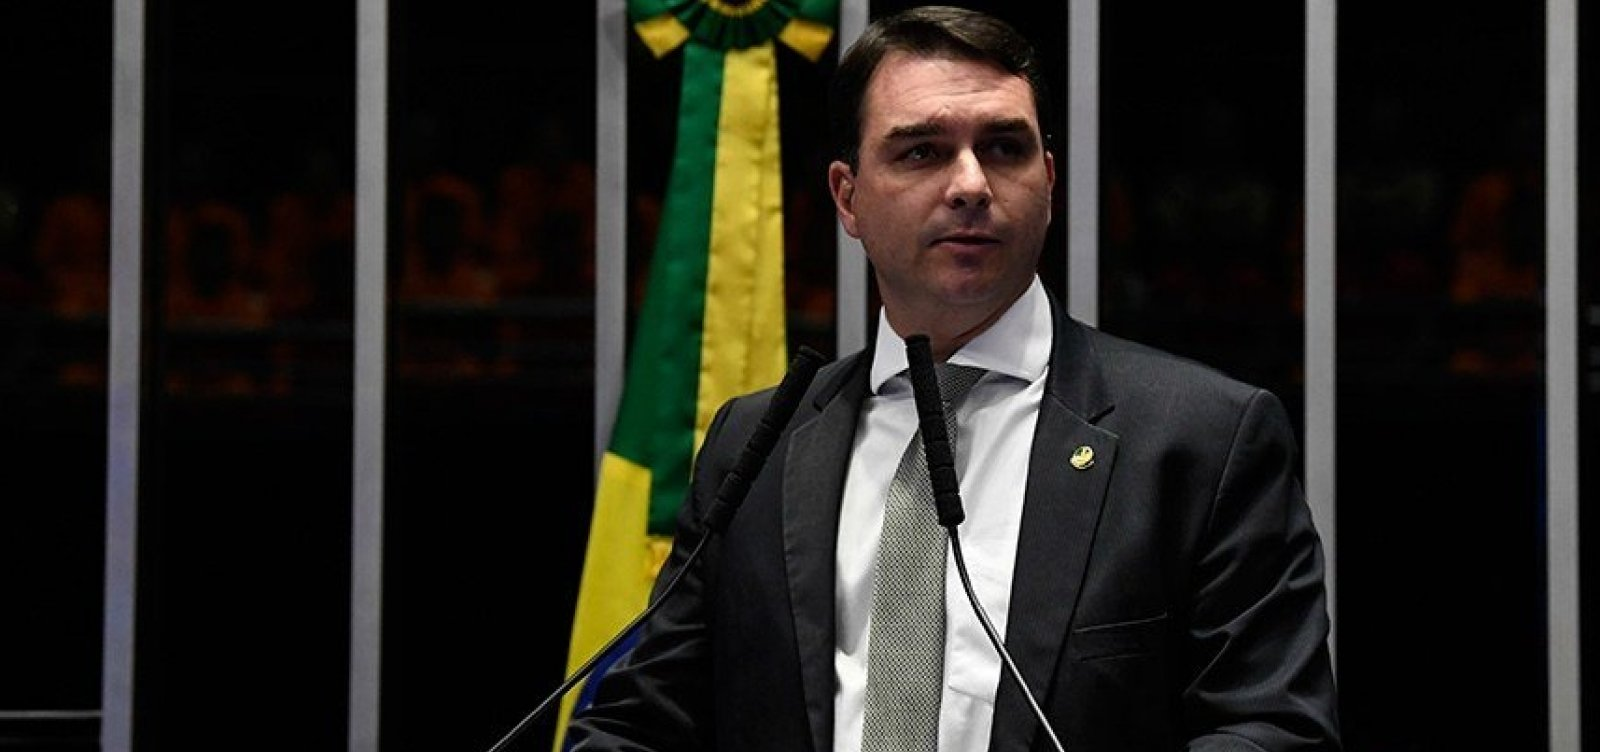 [Cúpula da PGR vai analisar 'vícios' do caso Flávio Bolsonaro]